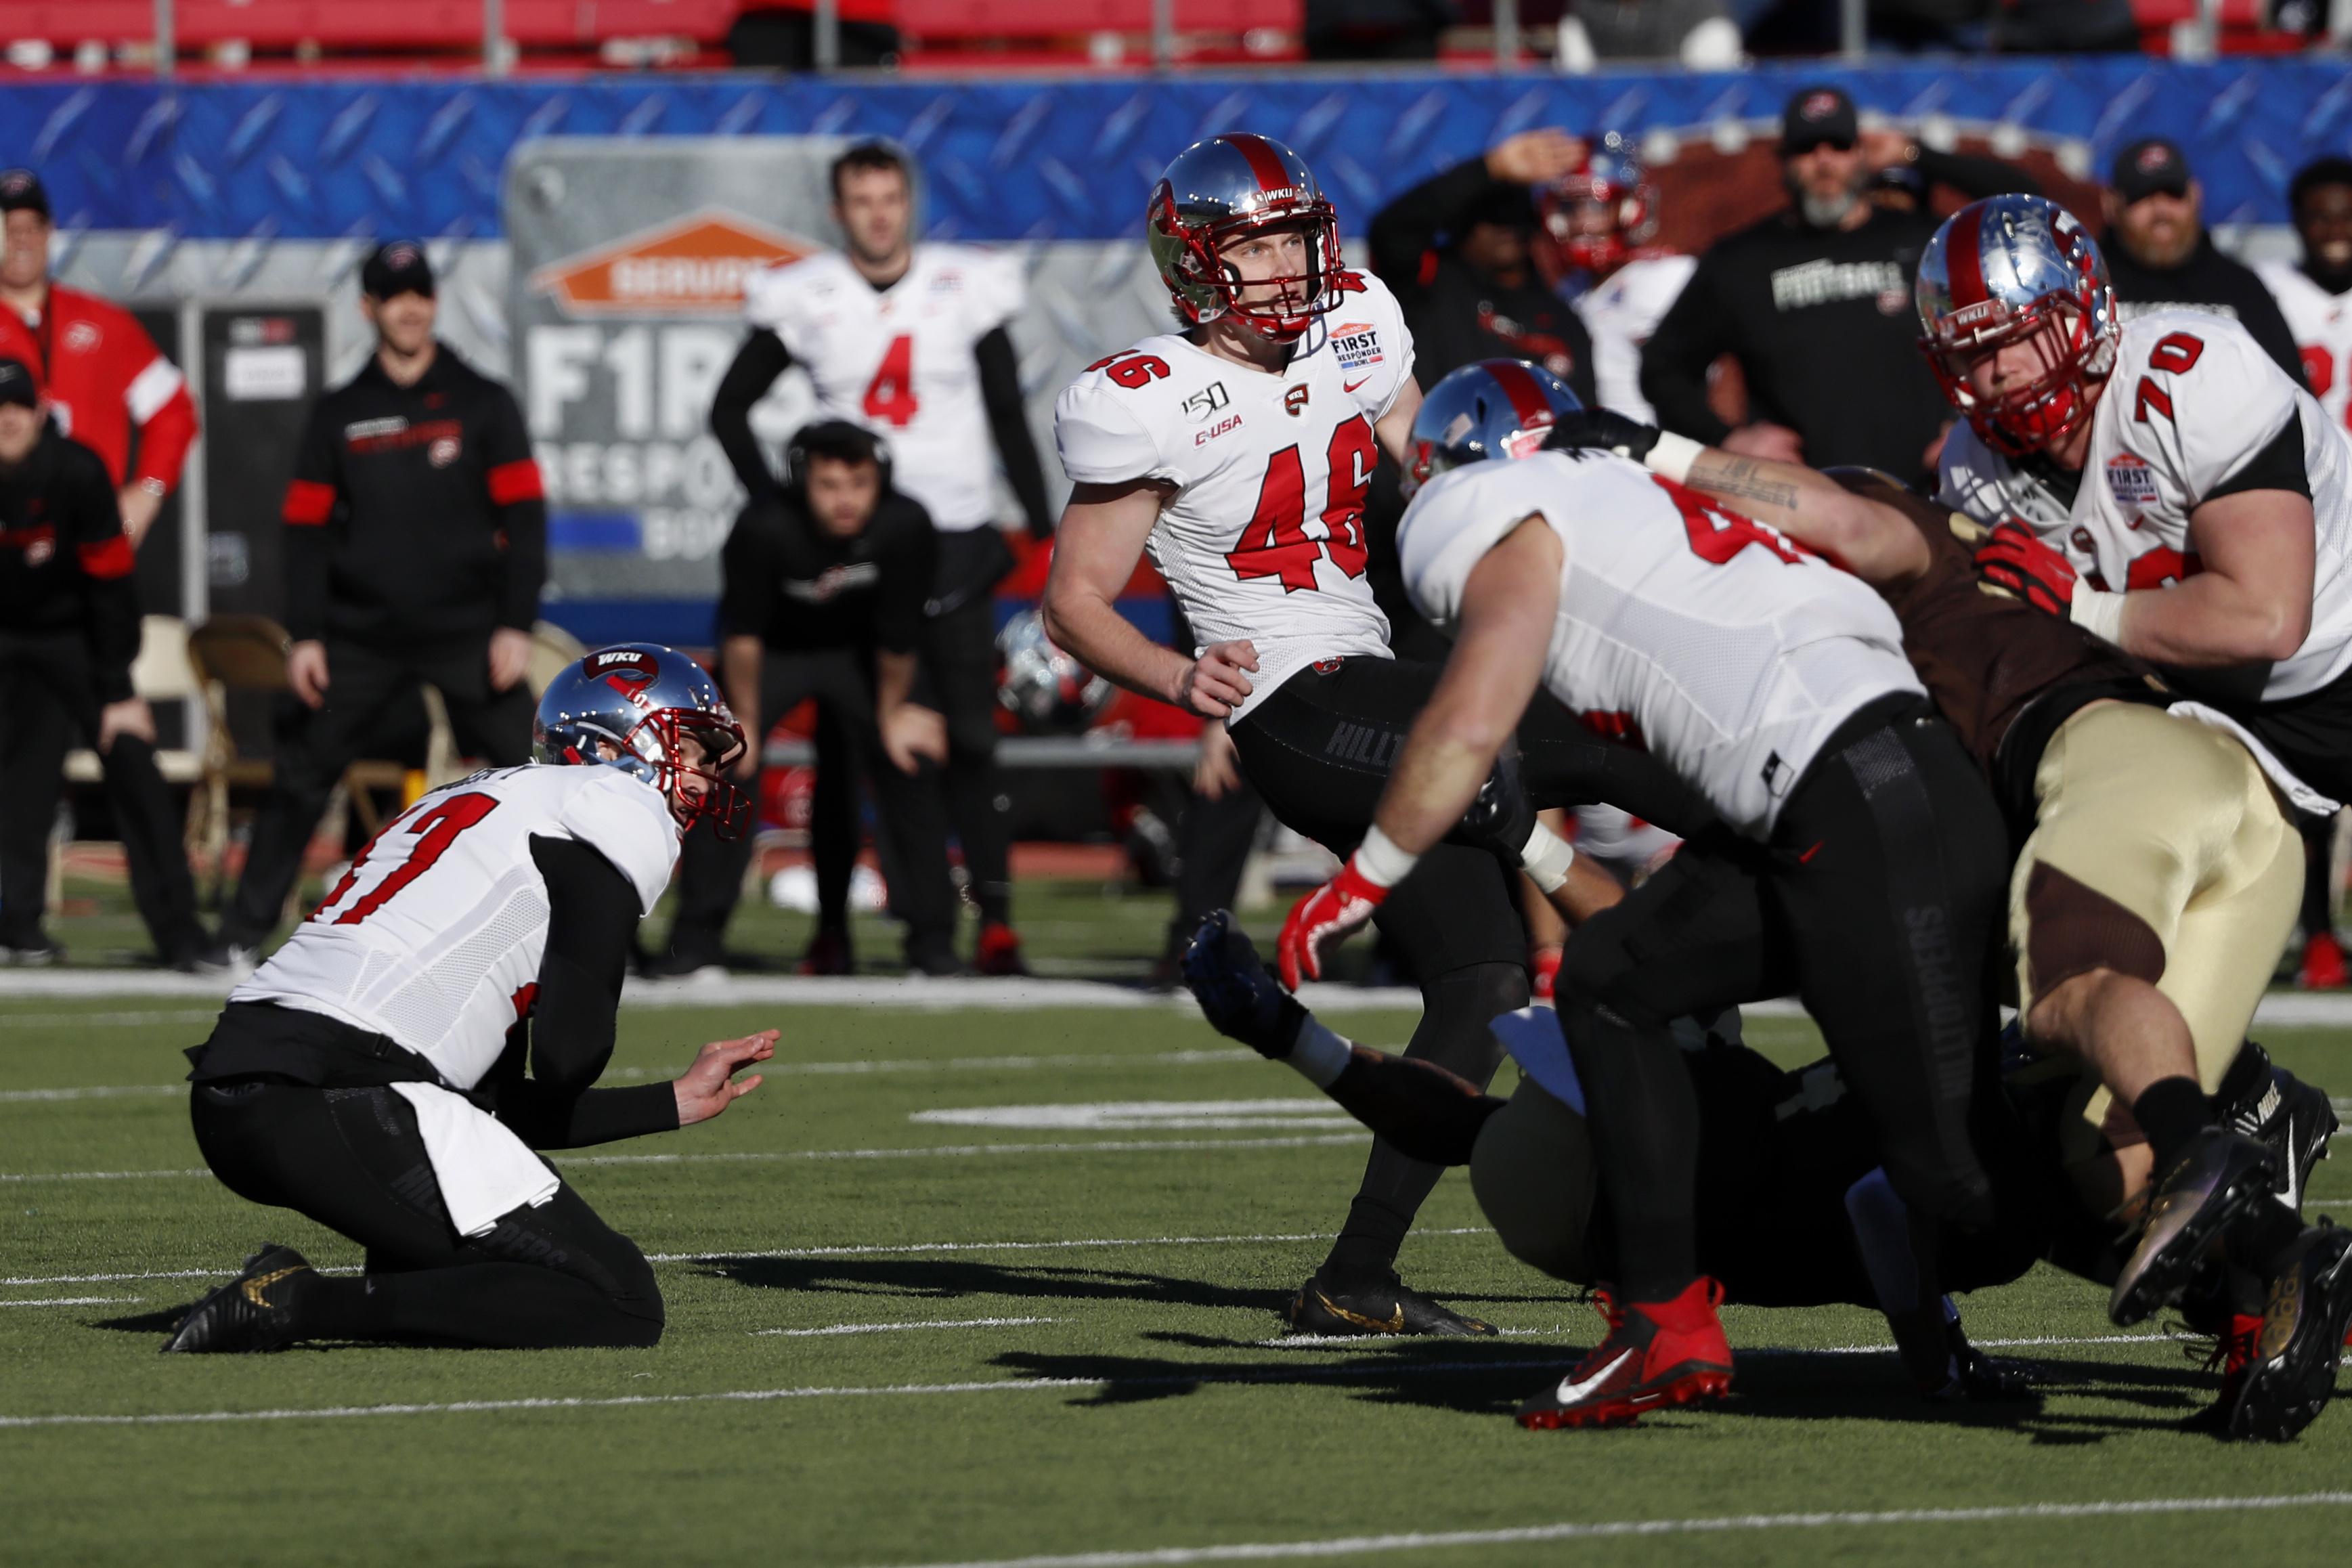 Western Kentucky wins First Responder Bowl 23-20 on FG